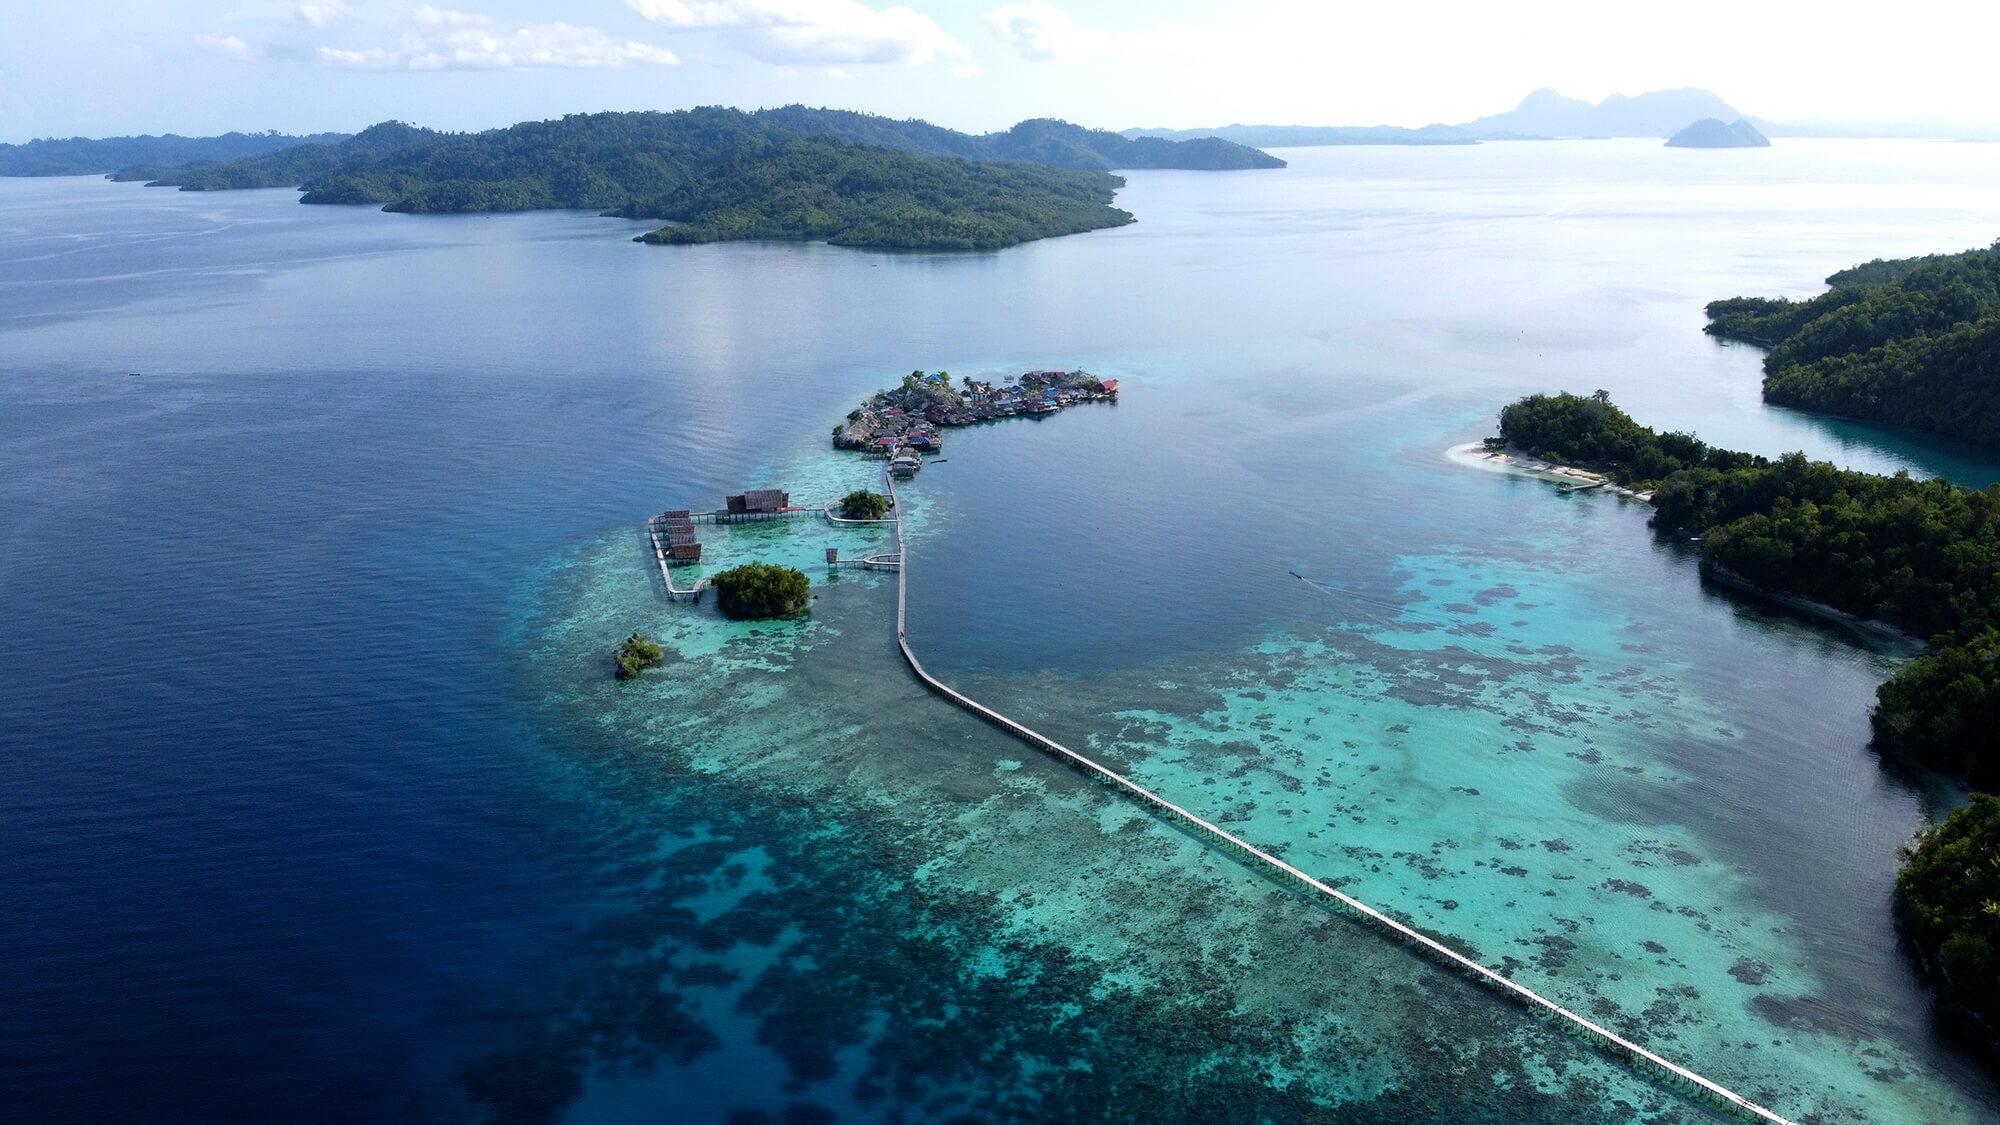 Panorámica de dron de la isla de Pulau Palan en Sulawesi